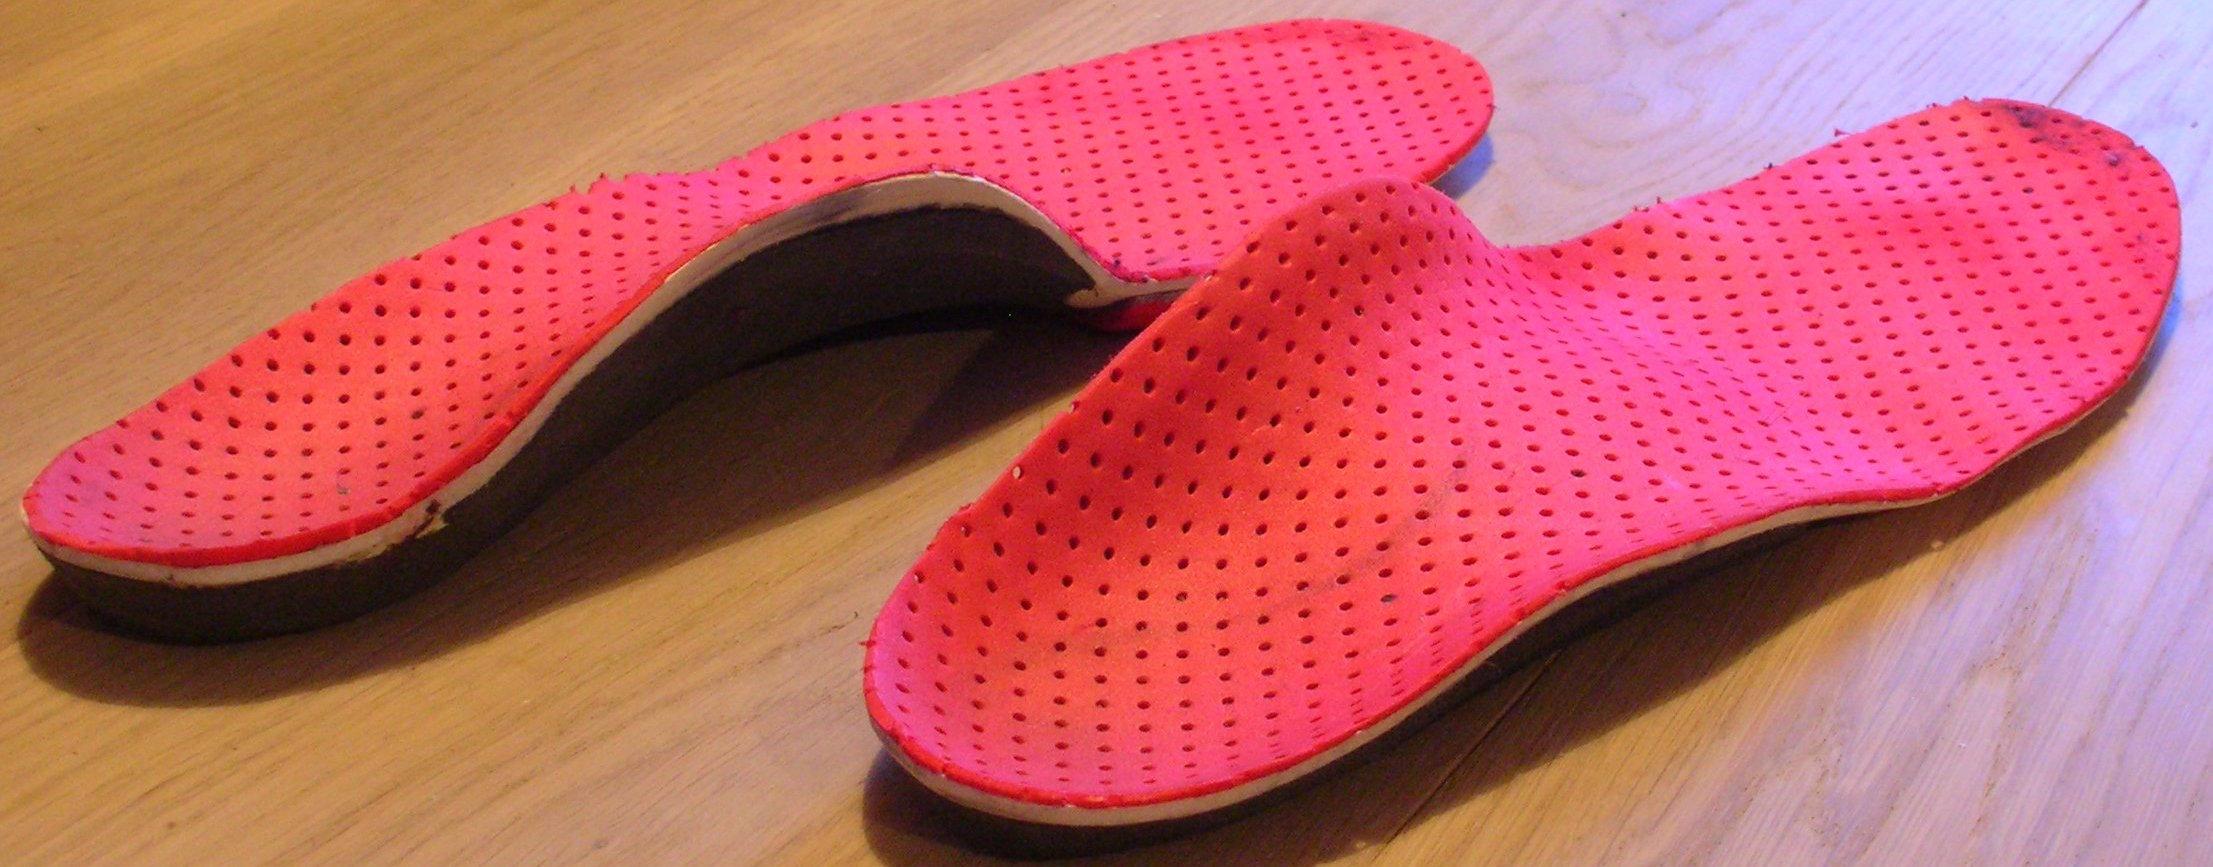 Softer, Flexible Orthotics for Comfort